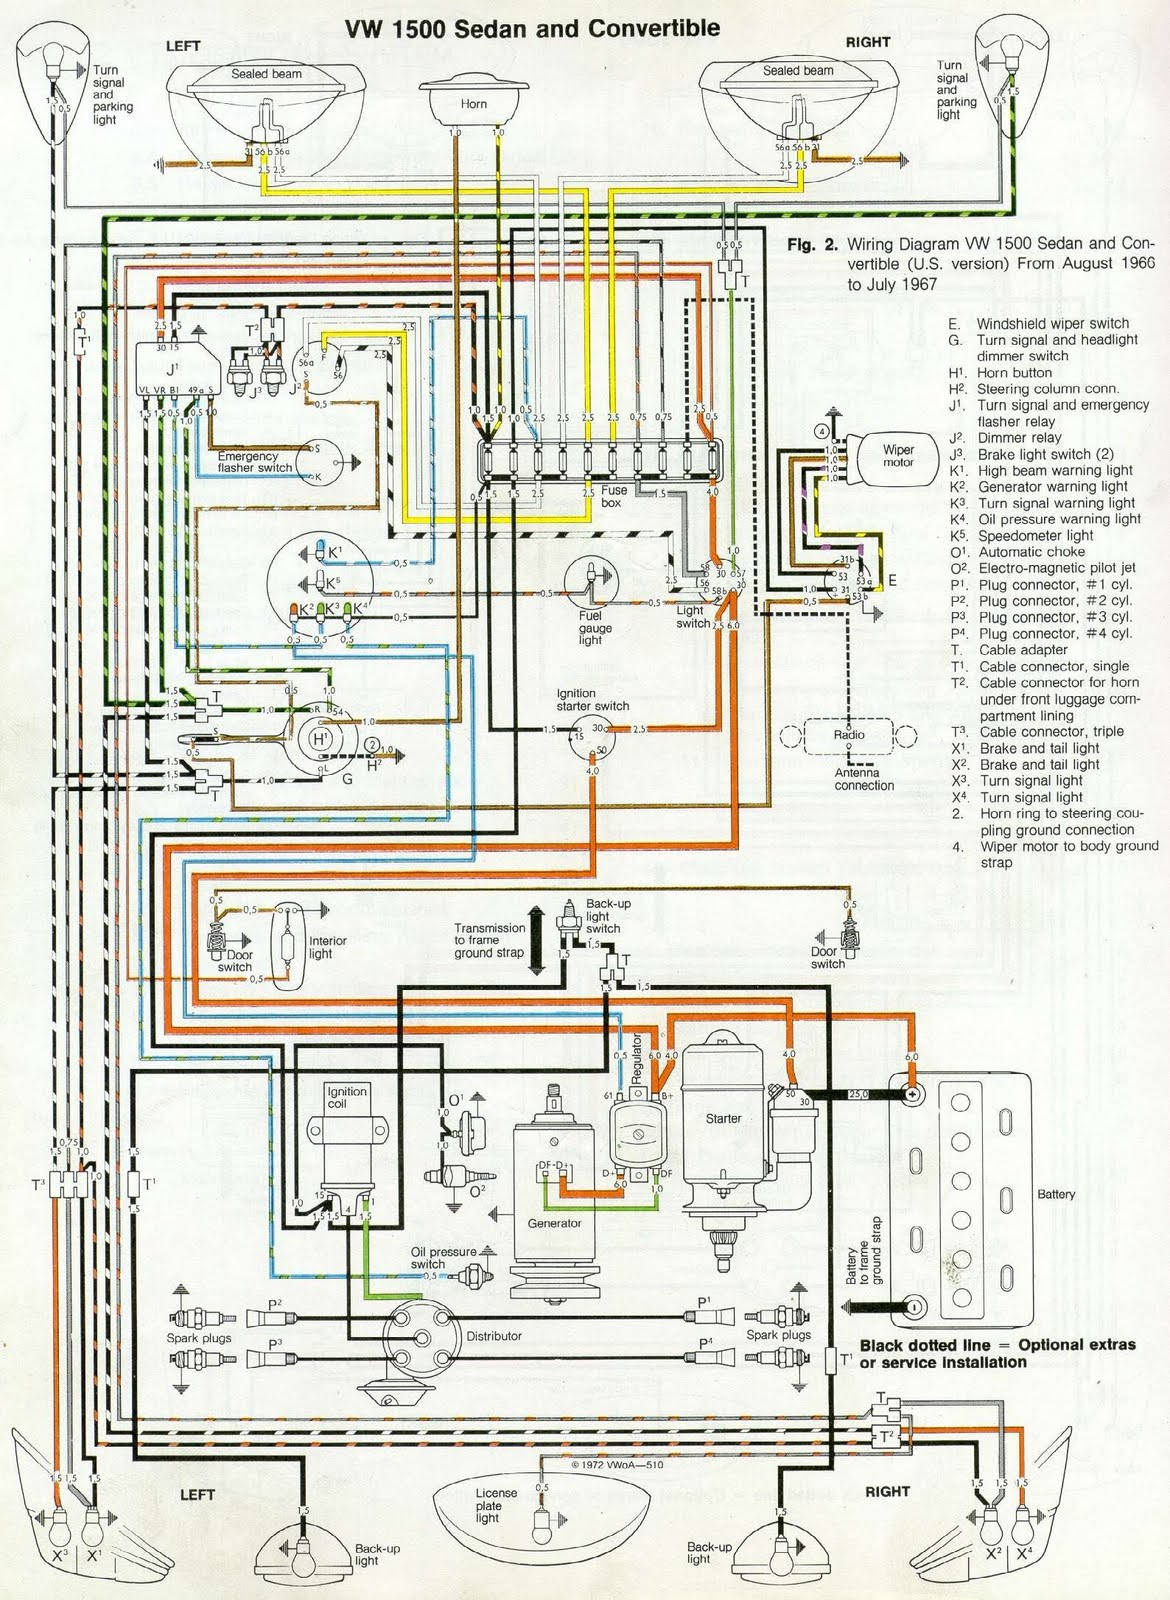 wrg 4274 vw 1971 fuse diagramvw 1971 fuse diagram 21 [ 1170 x 1600 Pixel ]